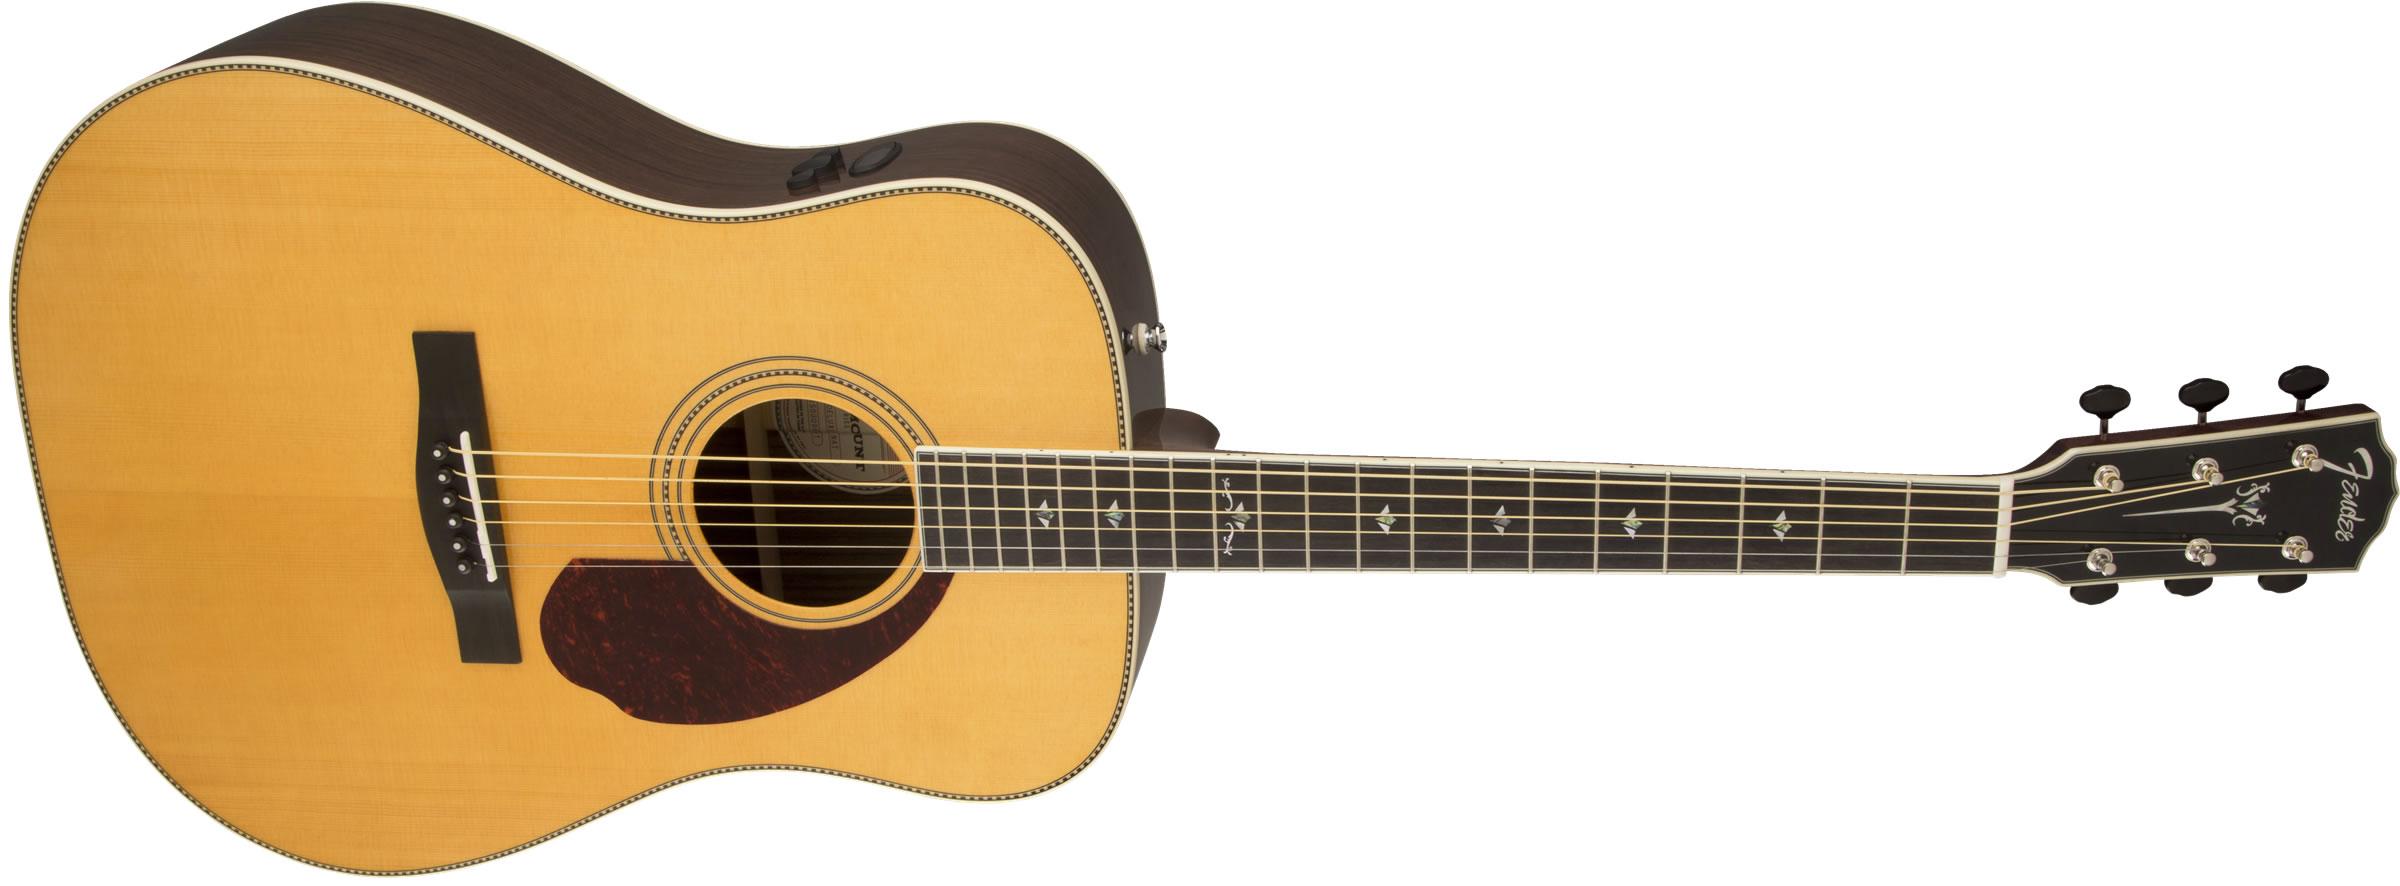 fender paramount series pm 1 deluxe natural elektro akustik gitar. Black Bedroom Furniture Sets. Home Design Ideas